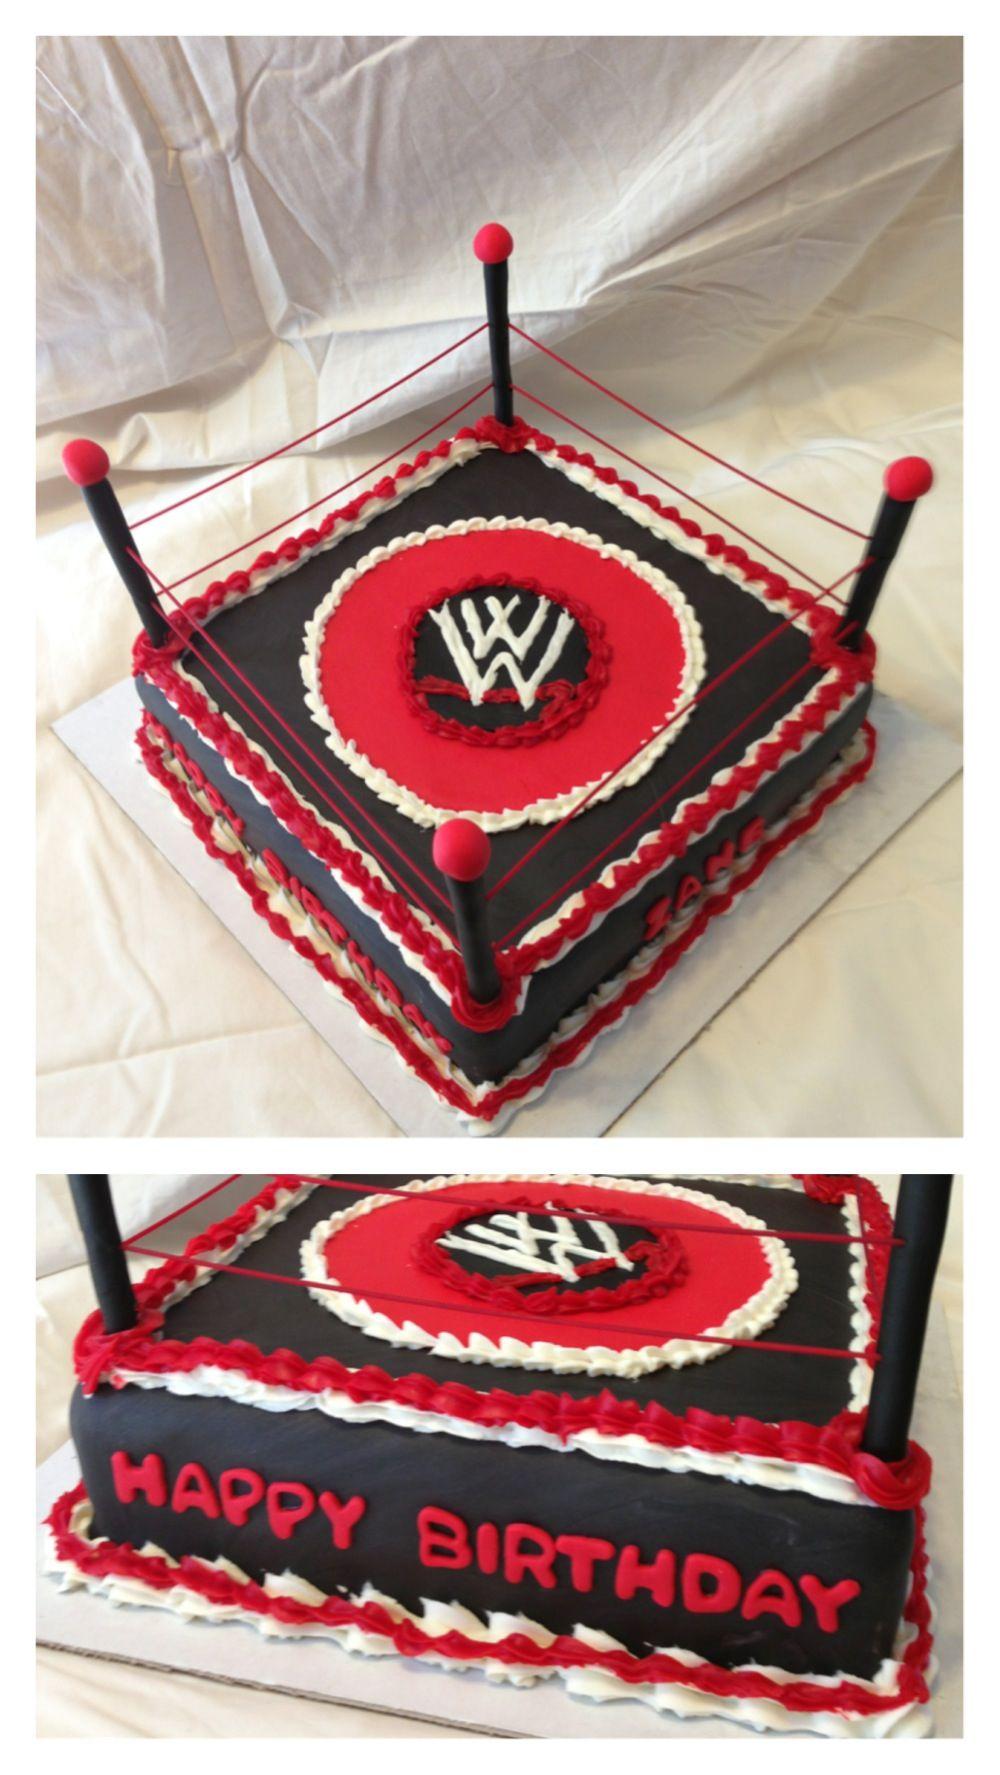 Wwe Wrestling Birthday Cake My Cake Creations Pinterest